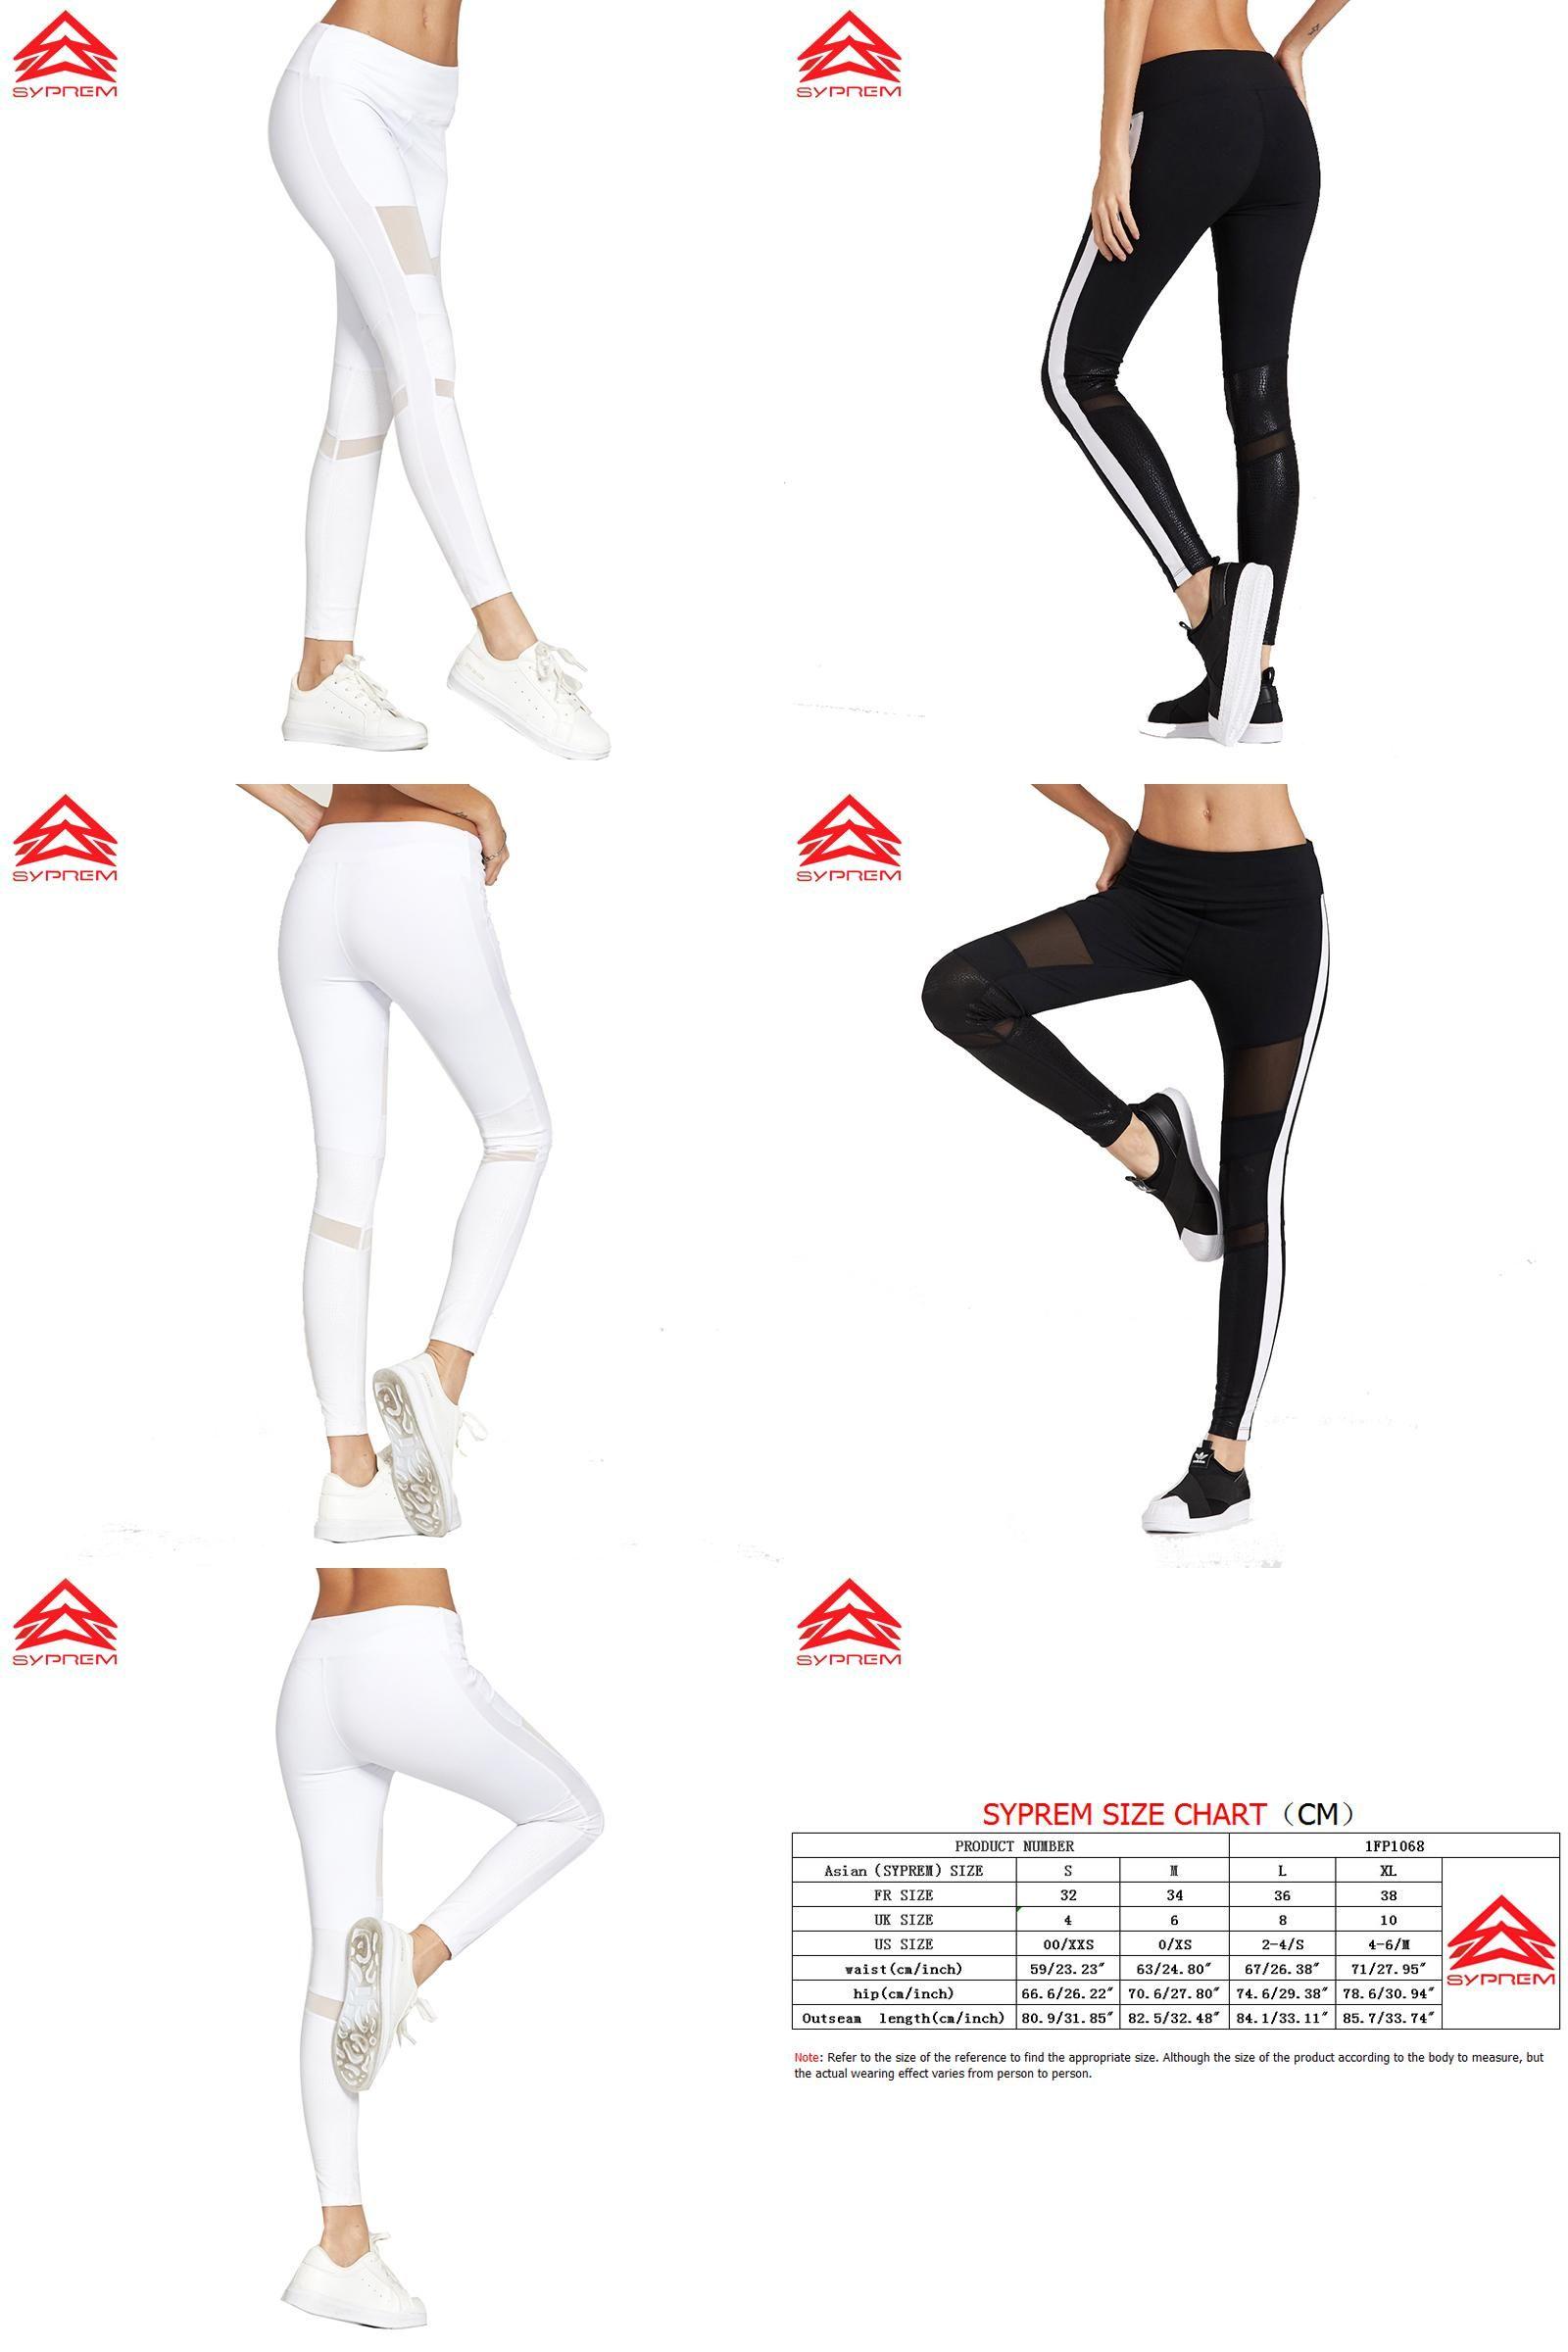 170433df17f63 [Visit to Buy] Syprem 2017 Spring Women Sexy Yoga Sports Pants Compression  Leggings Hollow Mesh Leggings Gym Skinny Fitness Sportswear,1FP1014 # ...